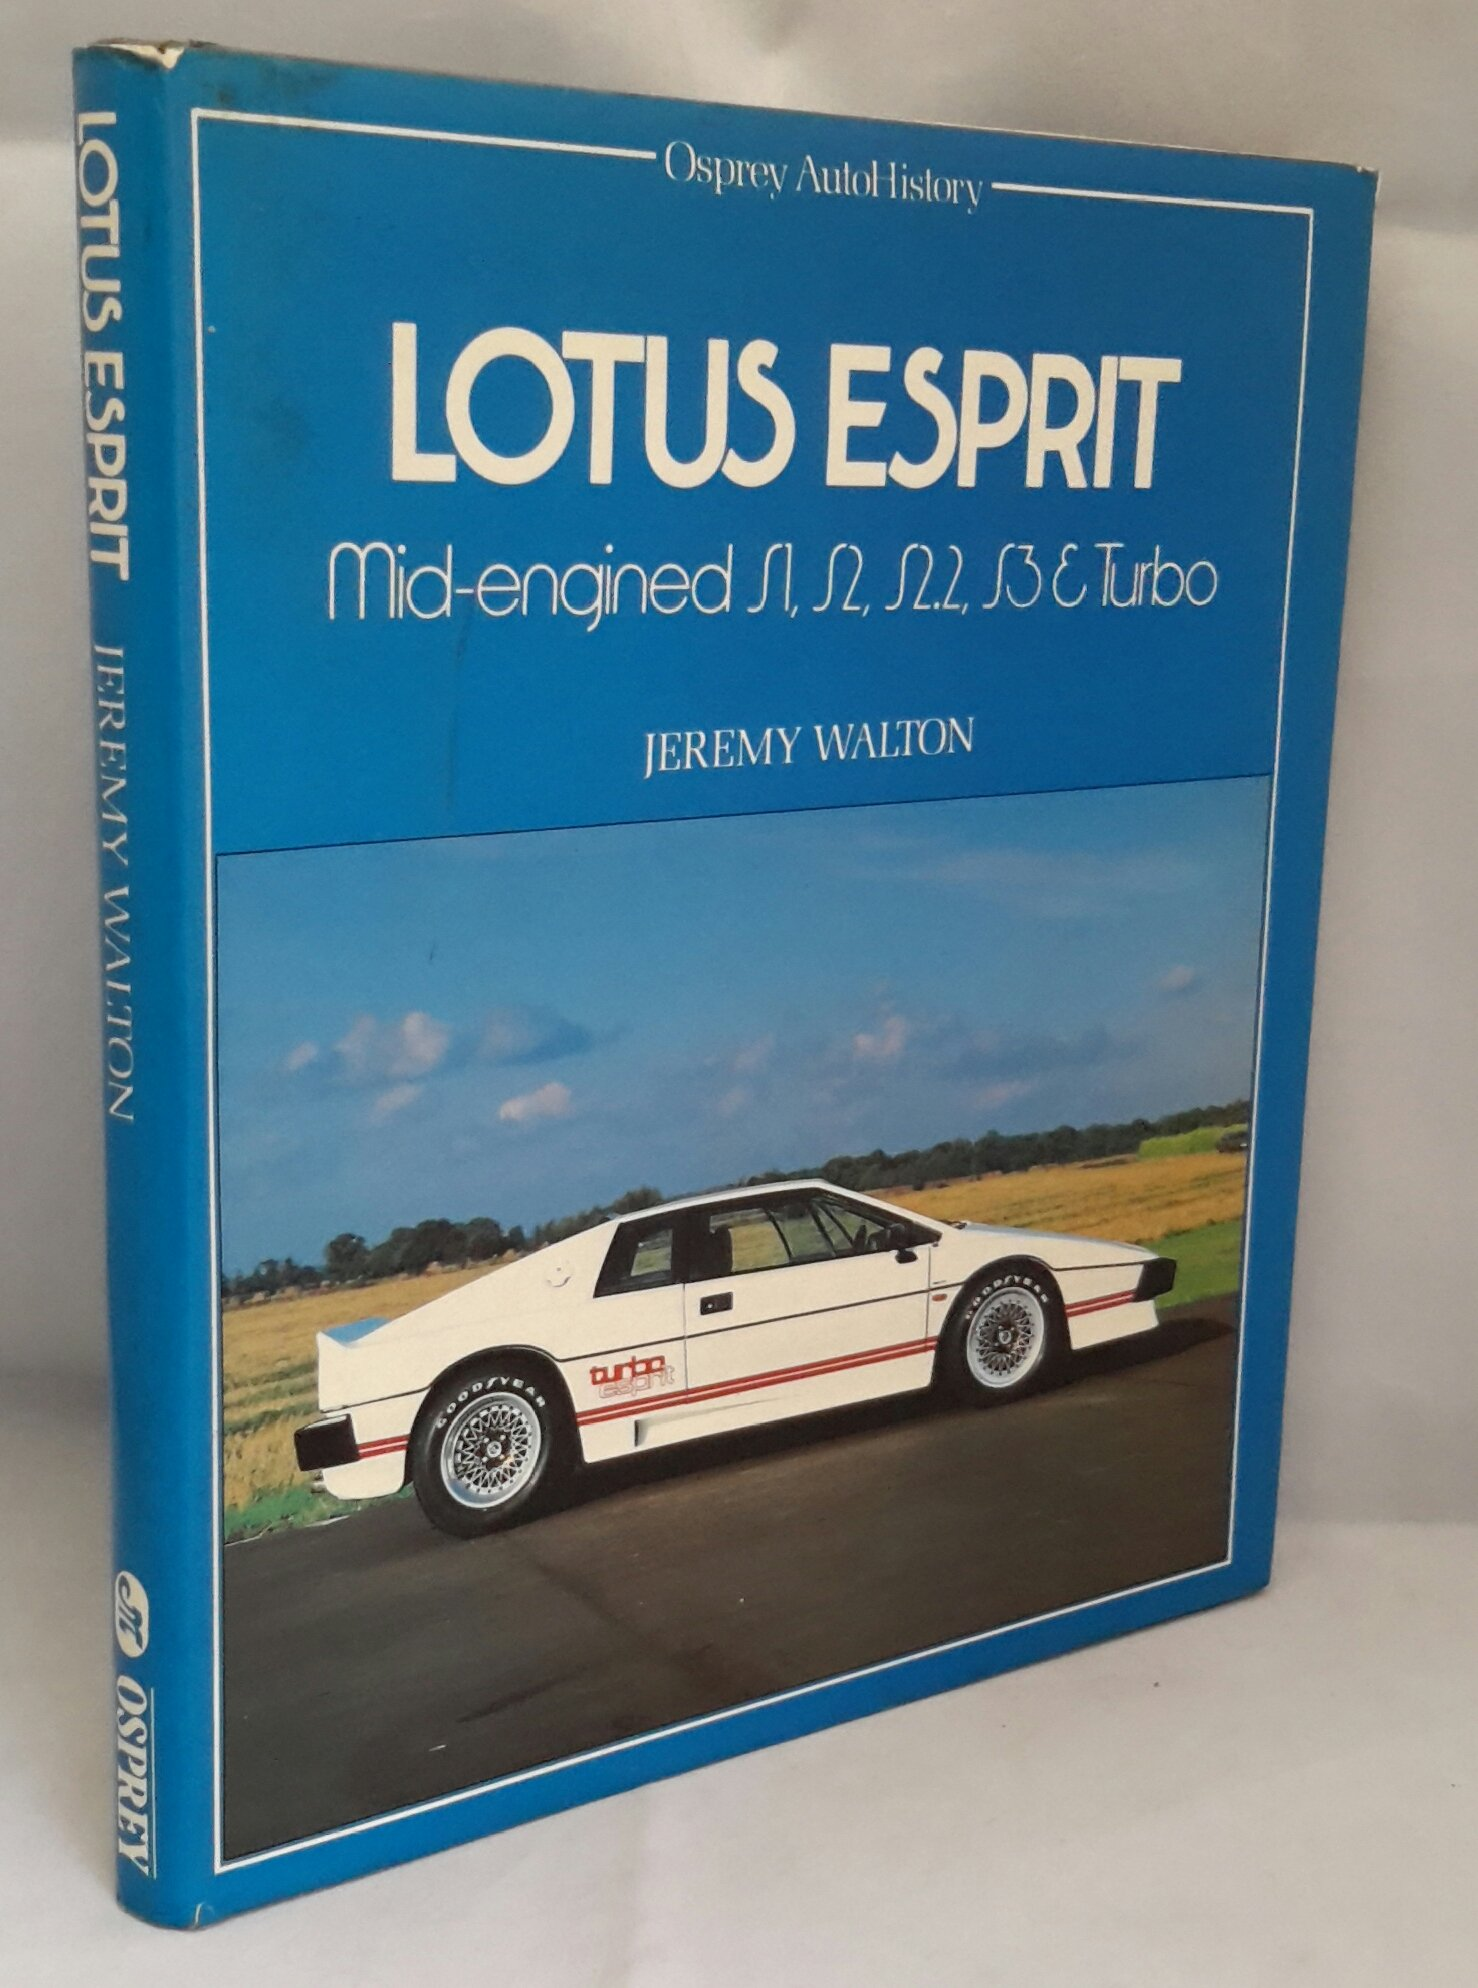 Lotus Esprit (Osprey autoHistory): Amazon.es: Jeremy Walton: Libros en idiomas extranjeros